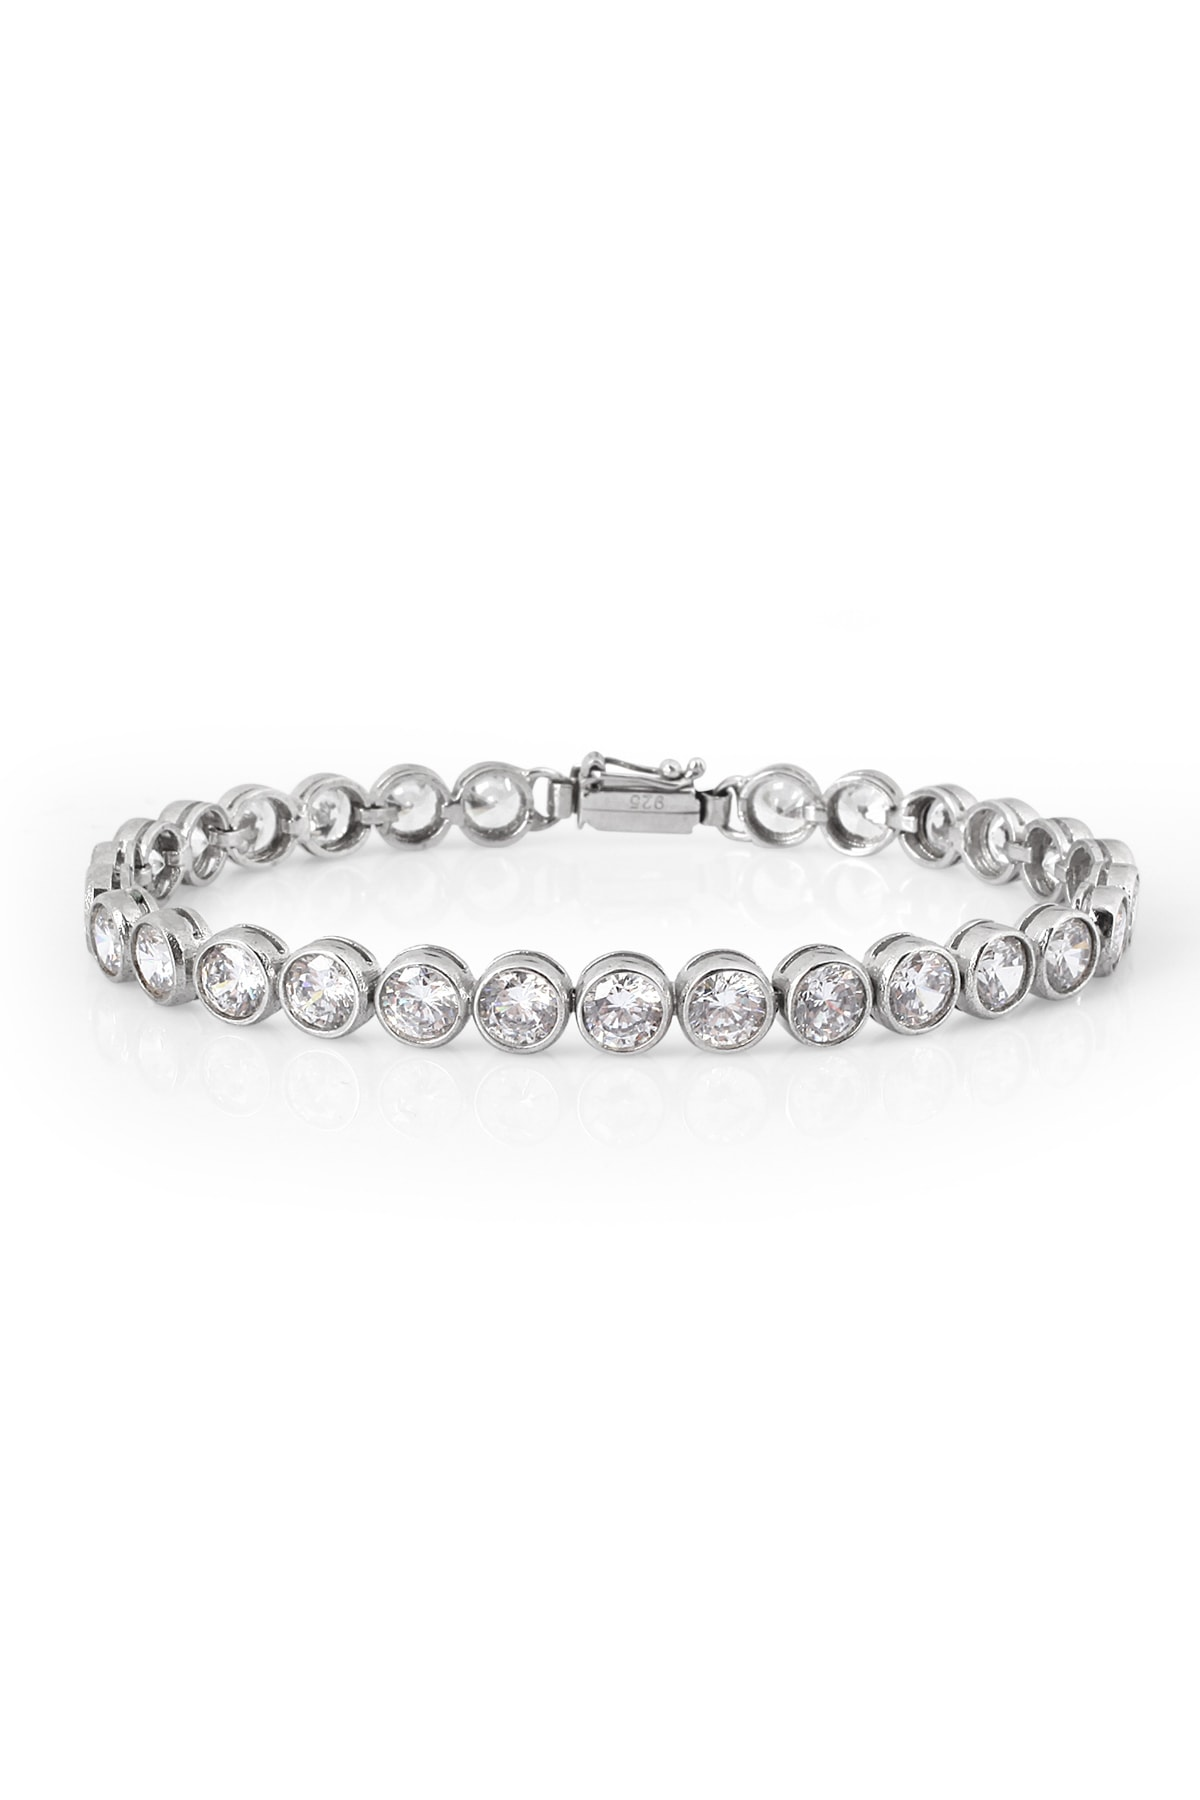 Chavin Kadın Su Yolu Taşlı Kadın  Gümüş Bileklik  ehy-cz84 1